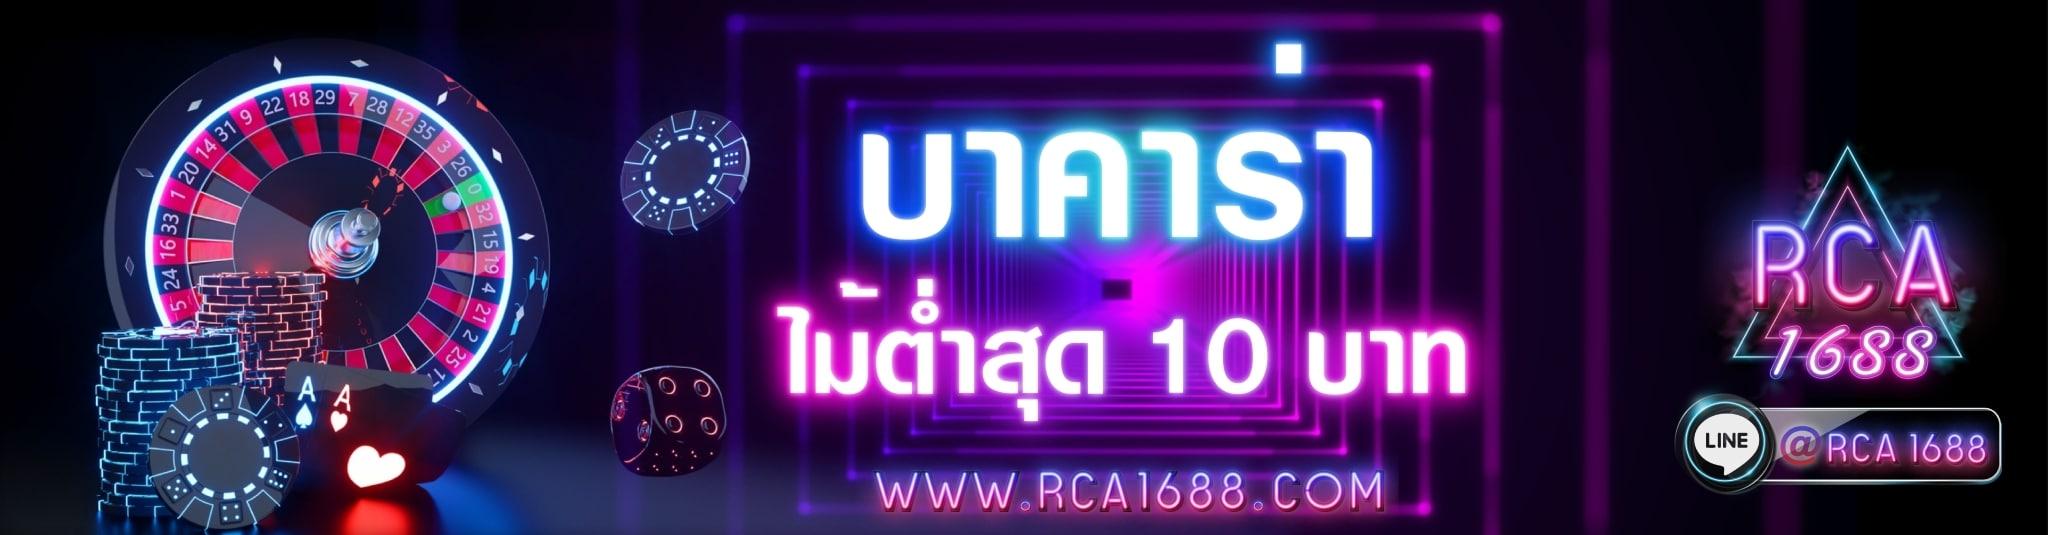 RCA1688_210209_2